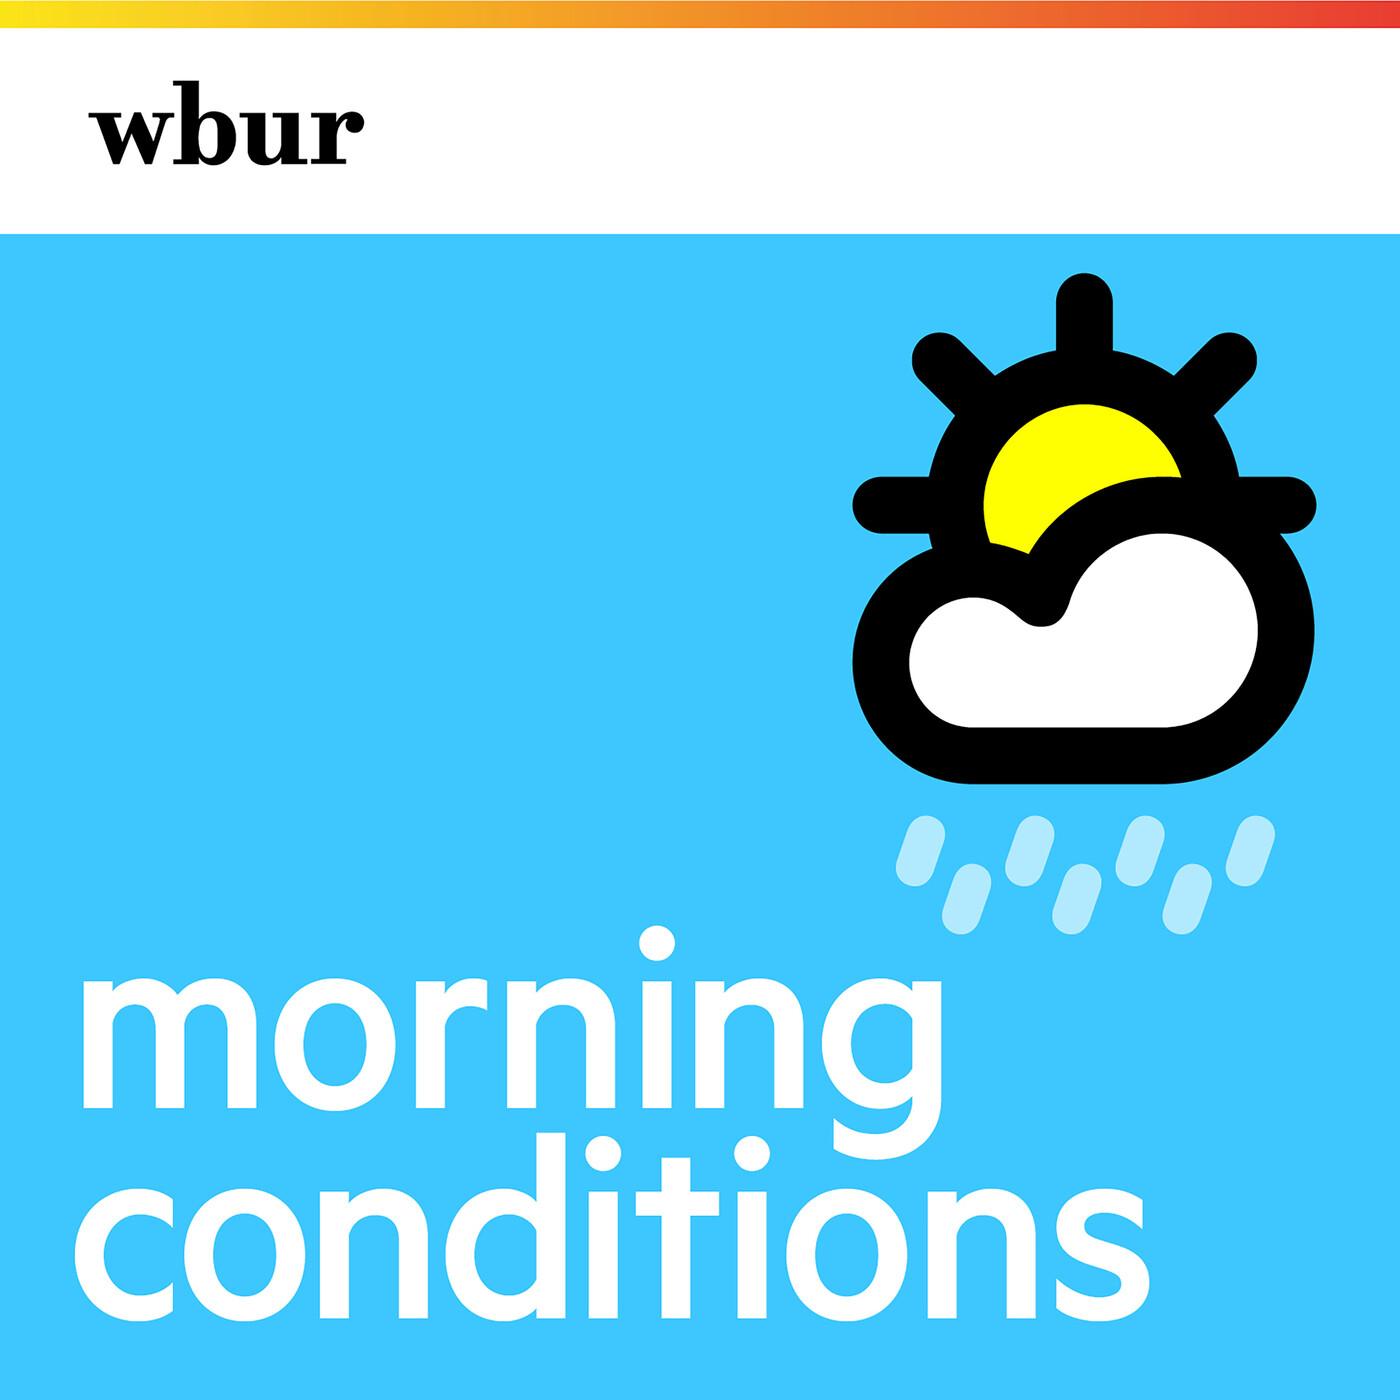 Forecast for Wednesday, Oct 21